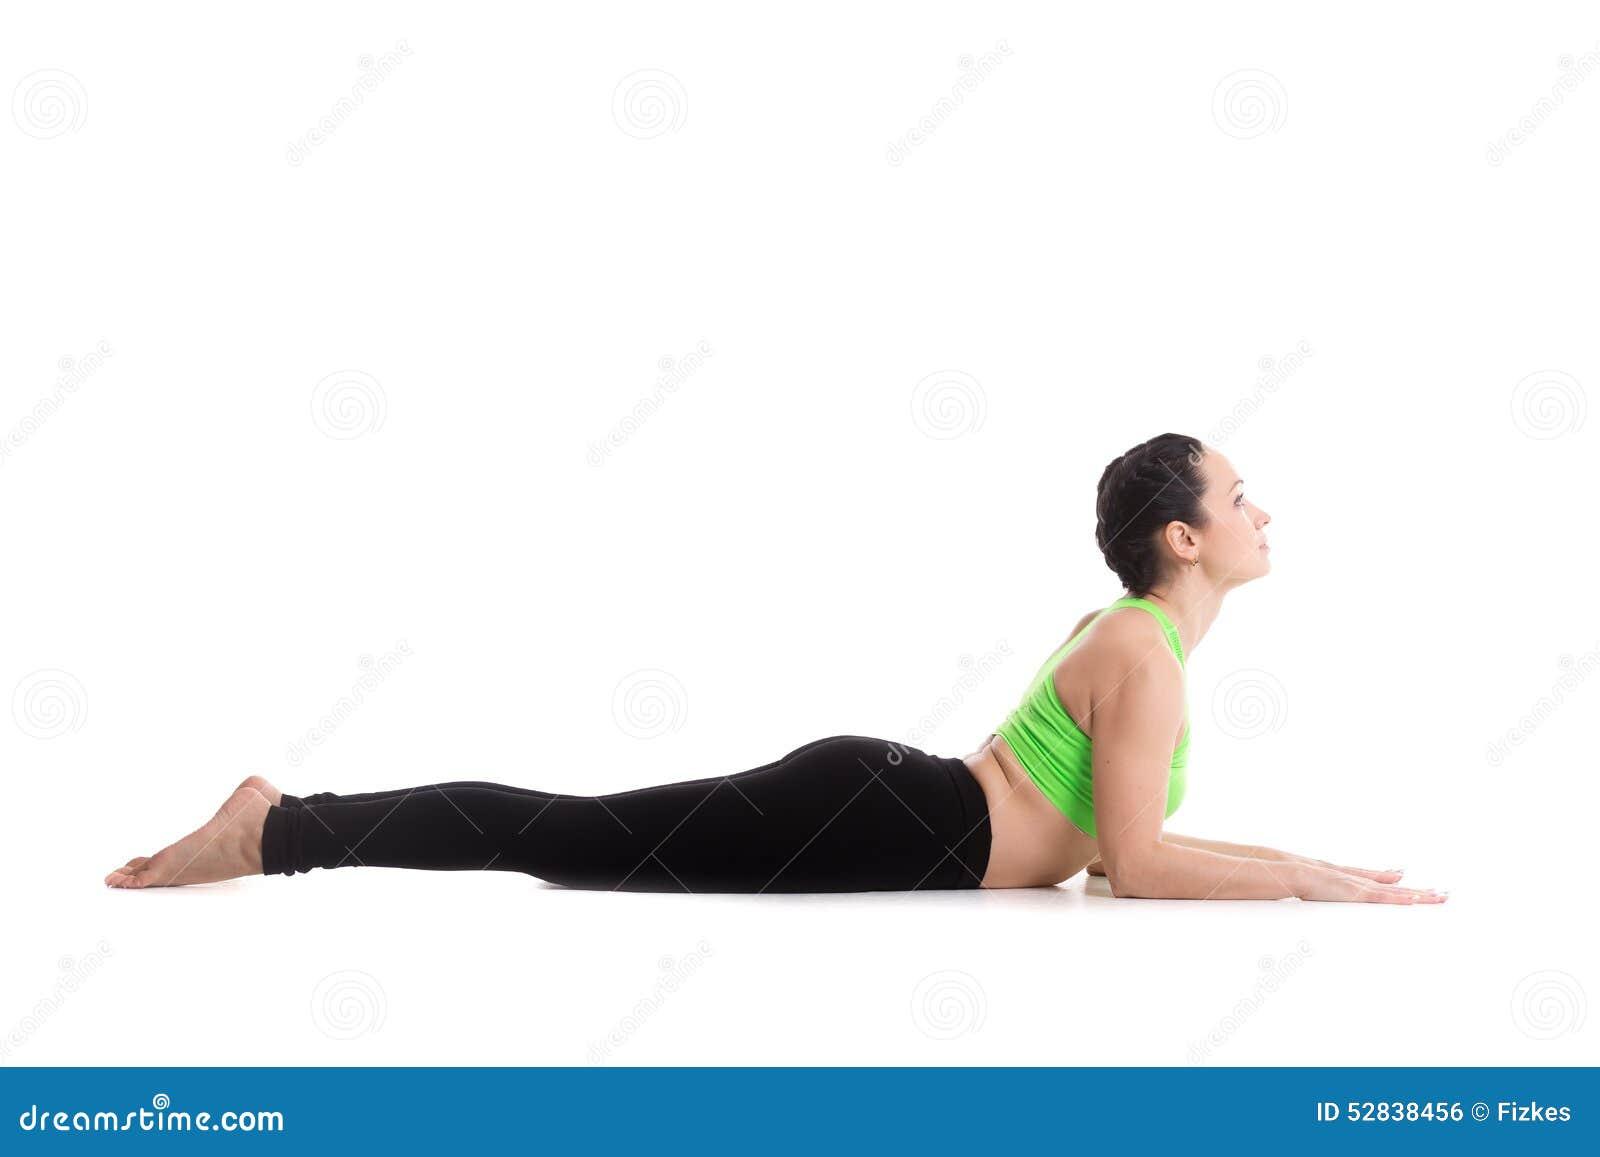 Download Sphinx Yoga Pose Stock Photo Image Of Bhujangasana Cobra